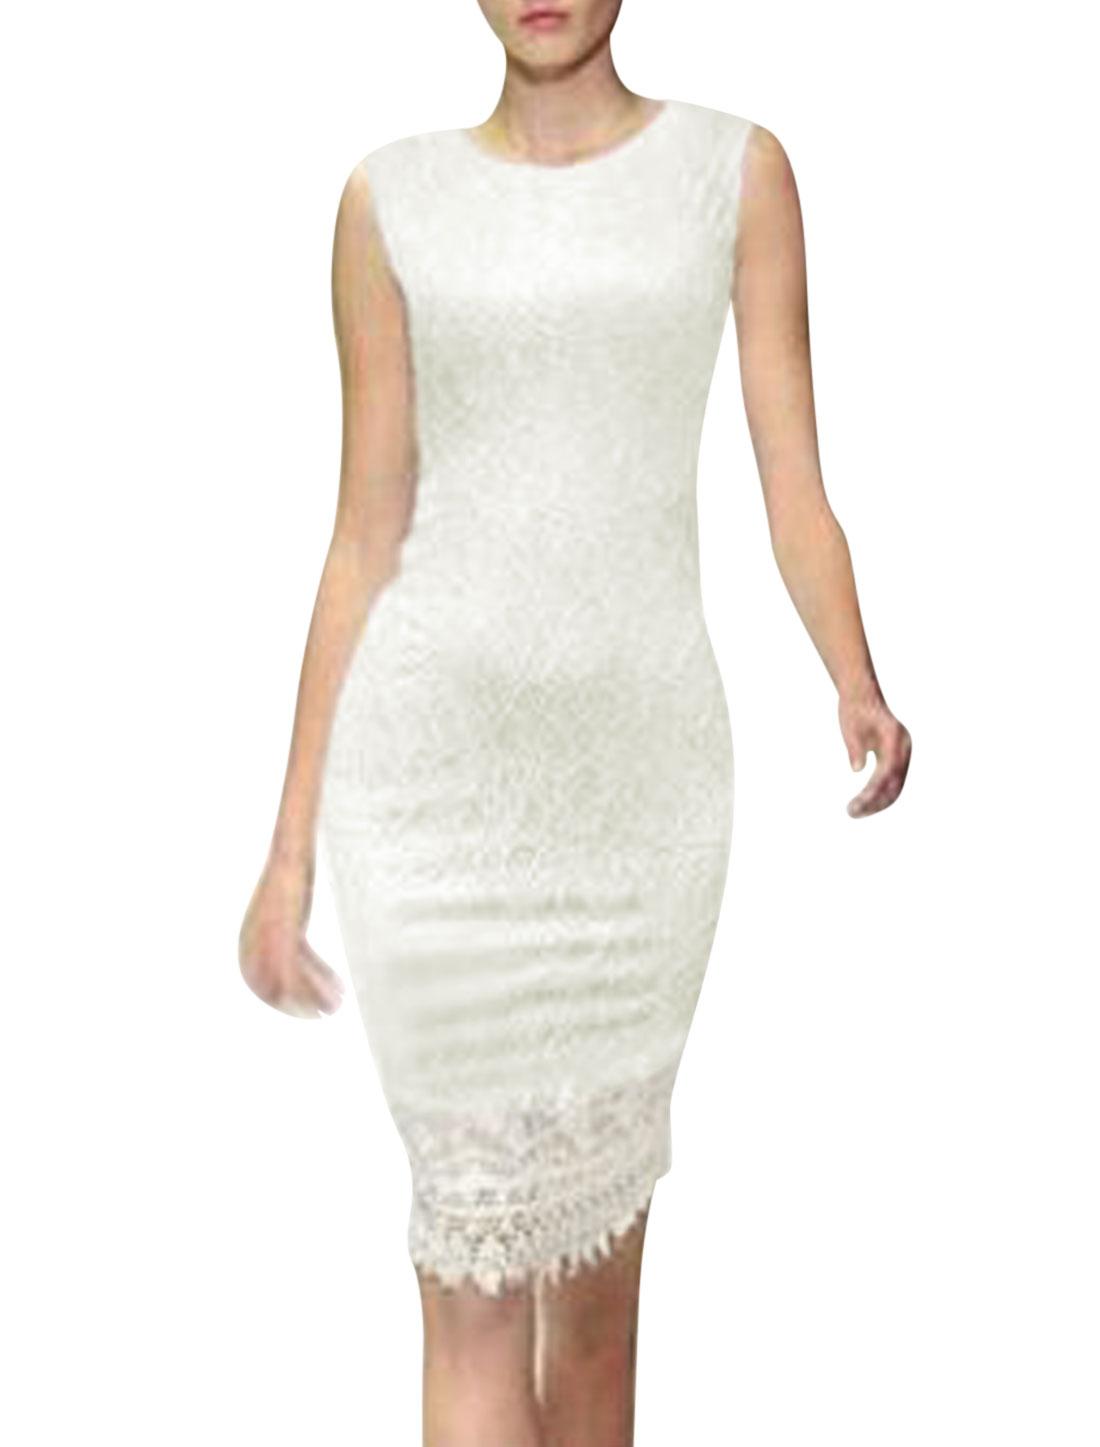 Women Round Neck Sleeveless Semi Sheer Lace Sheath Dress White M